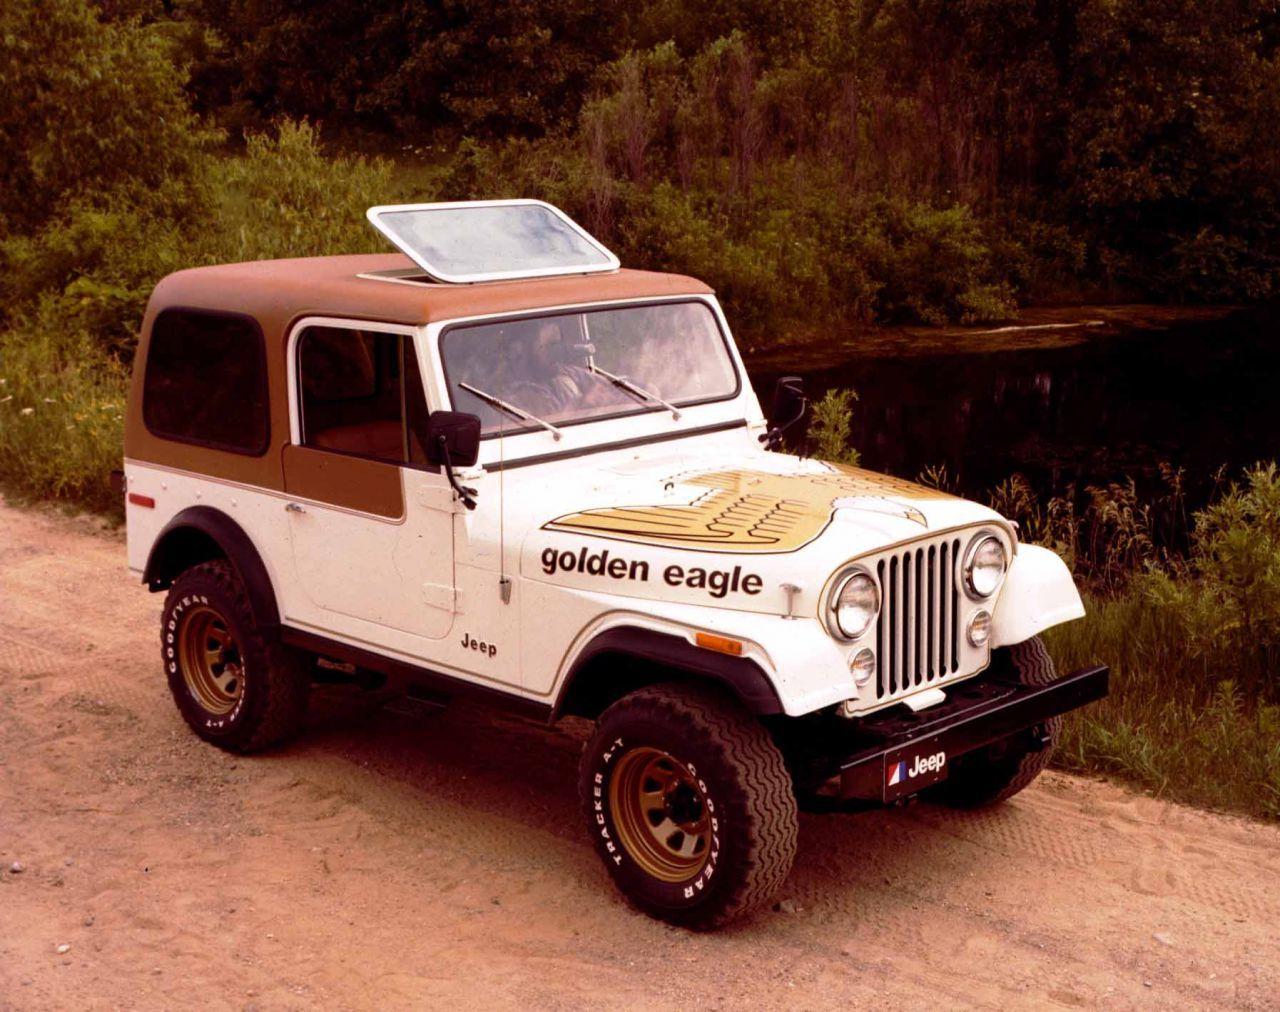 Jeep Cj7 Golden Eagle 1976 Jeep Cj Vintage Jeep Classic Jeeps